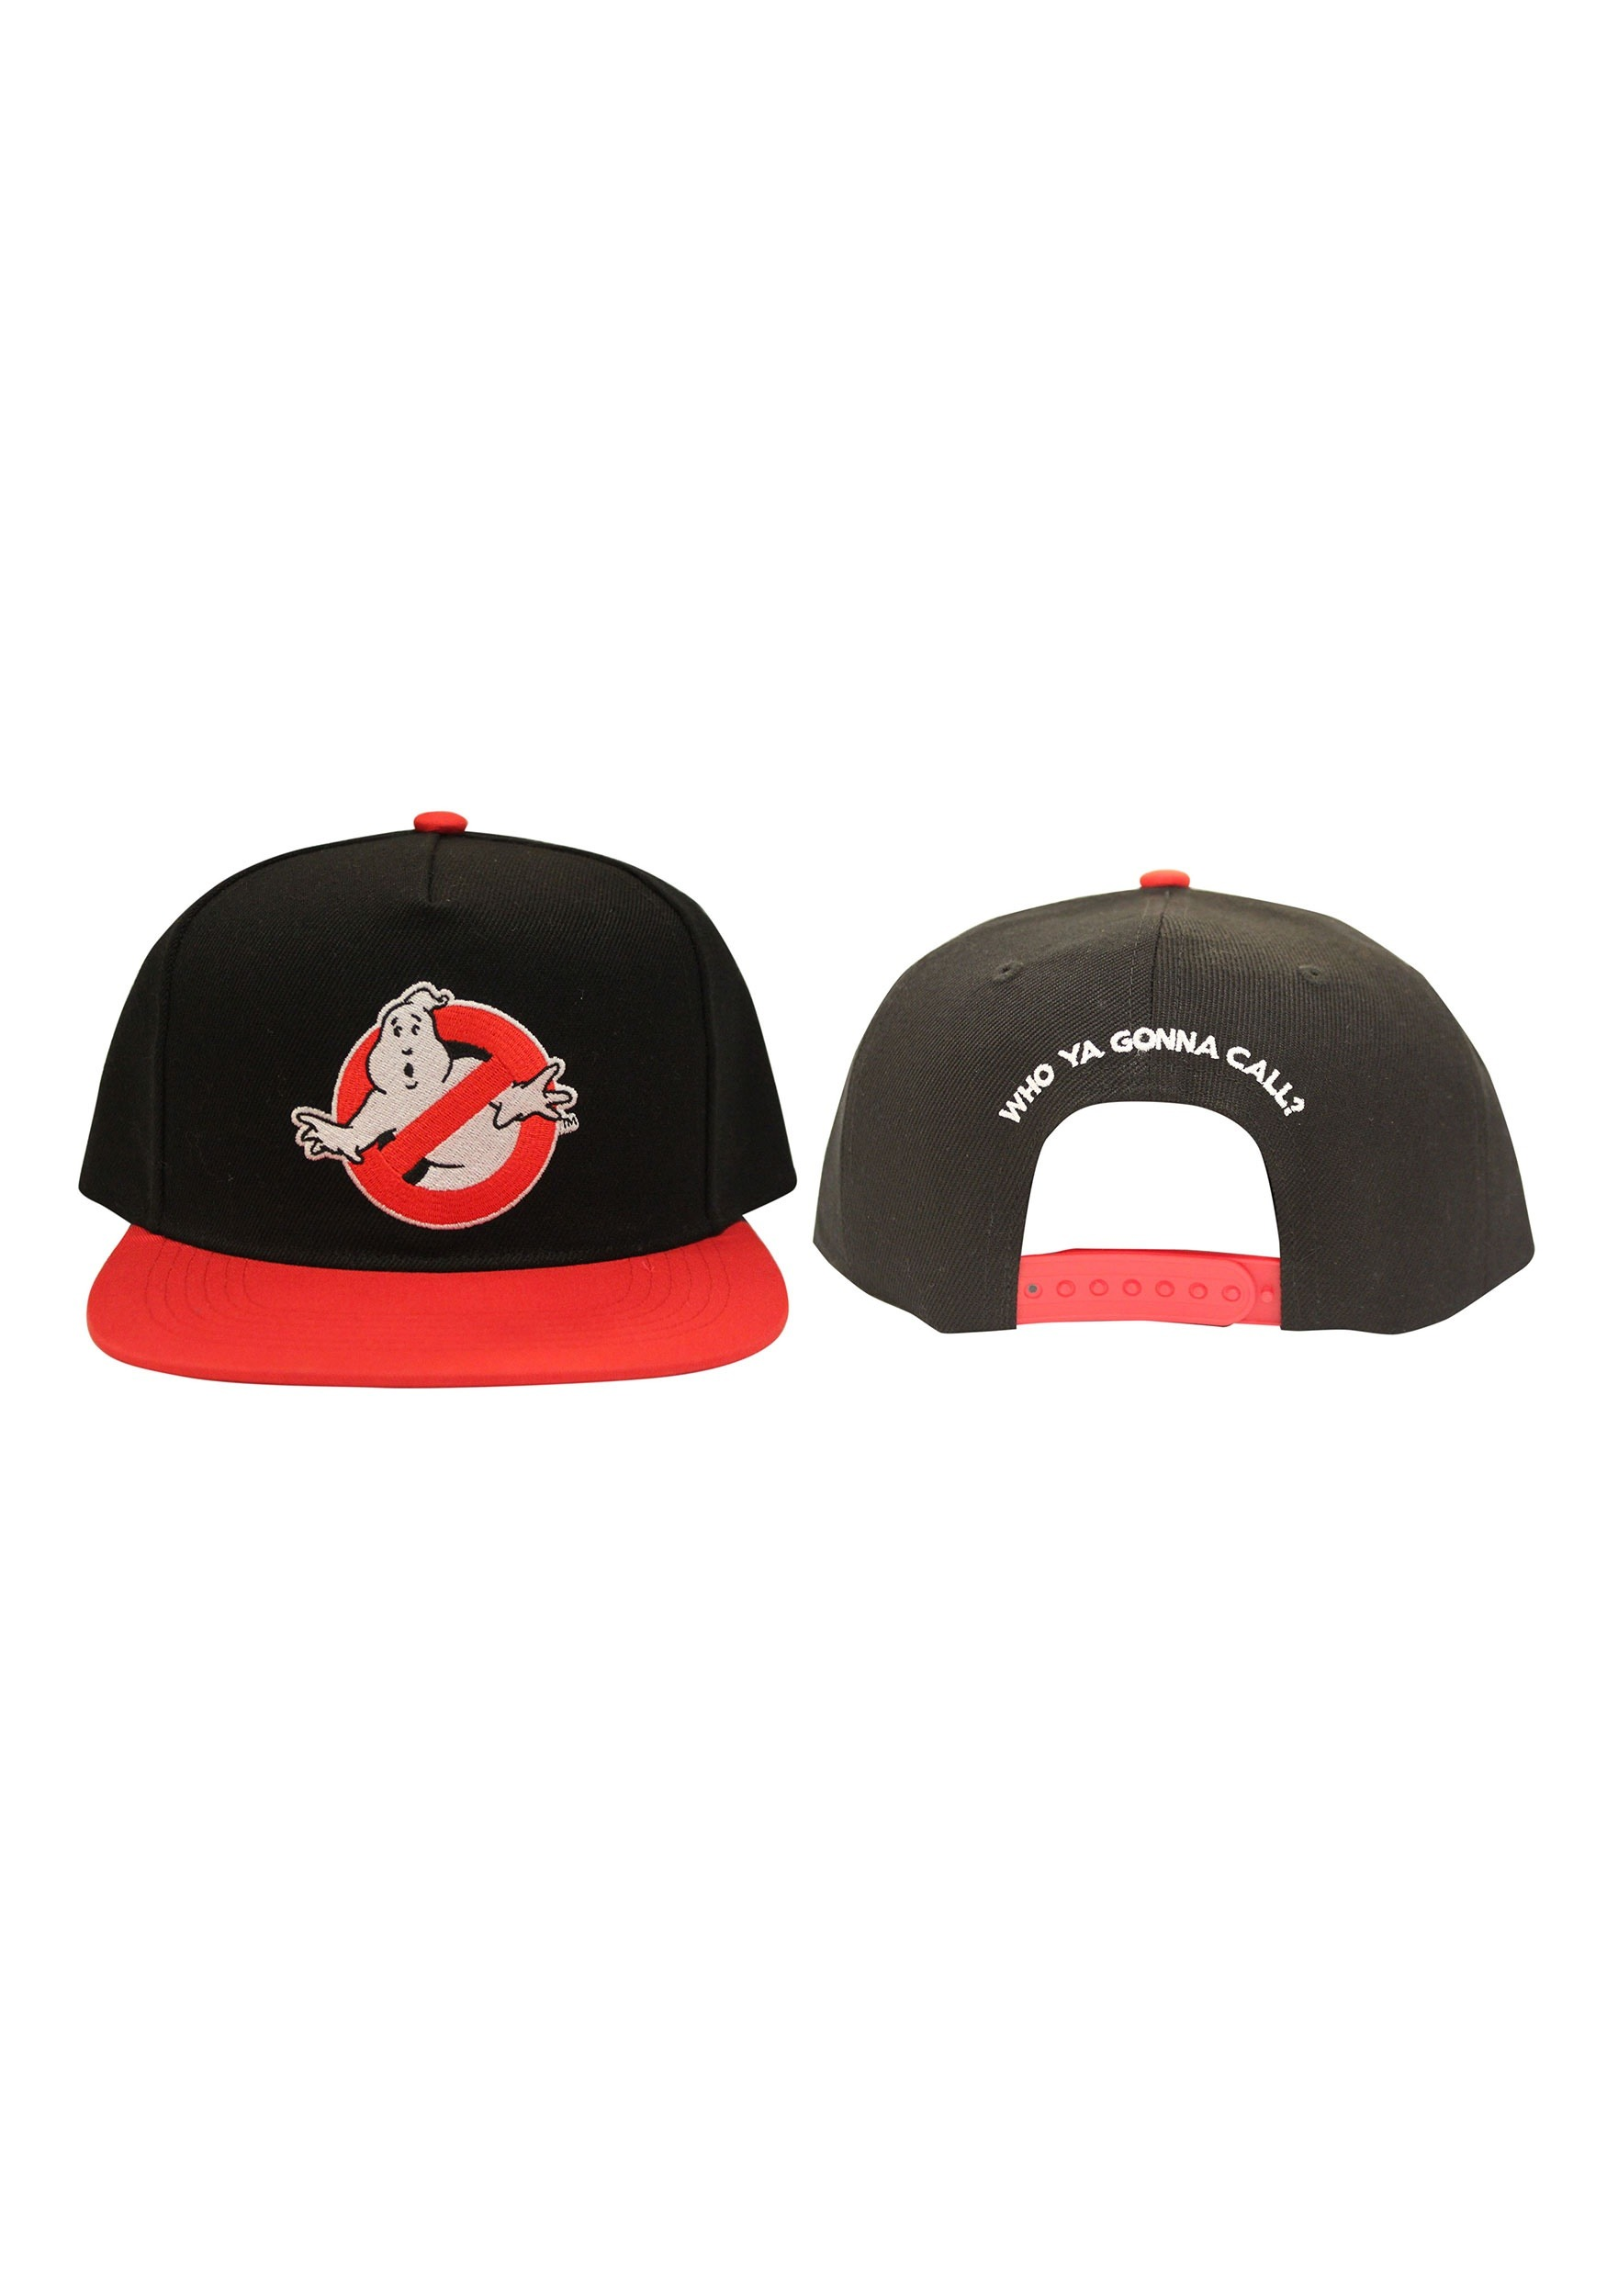 e33a838b5e4 The Ghostbusters Snapback Cap